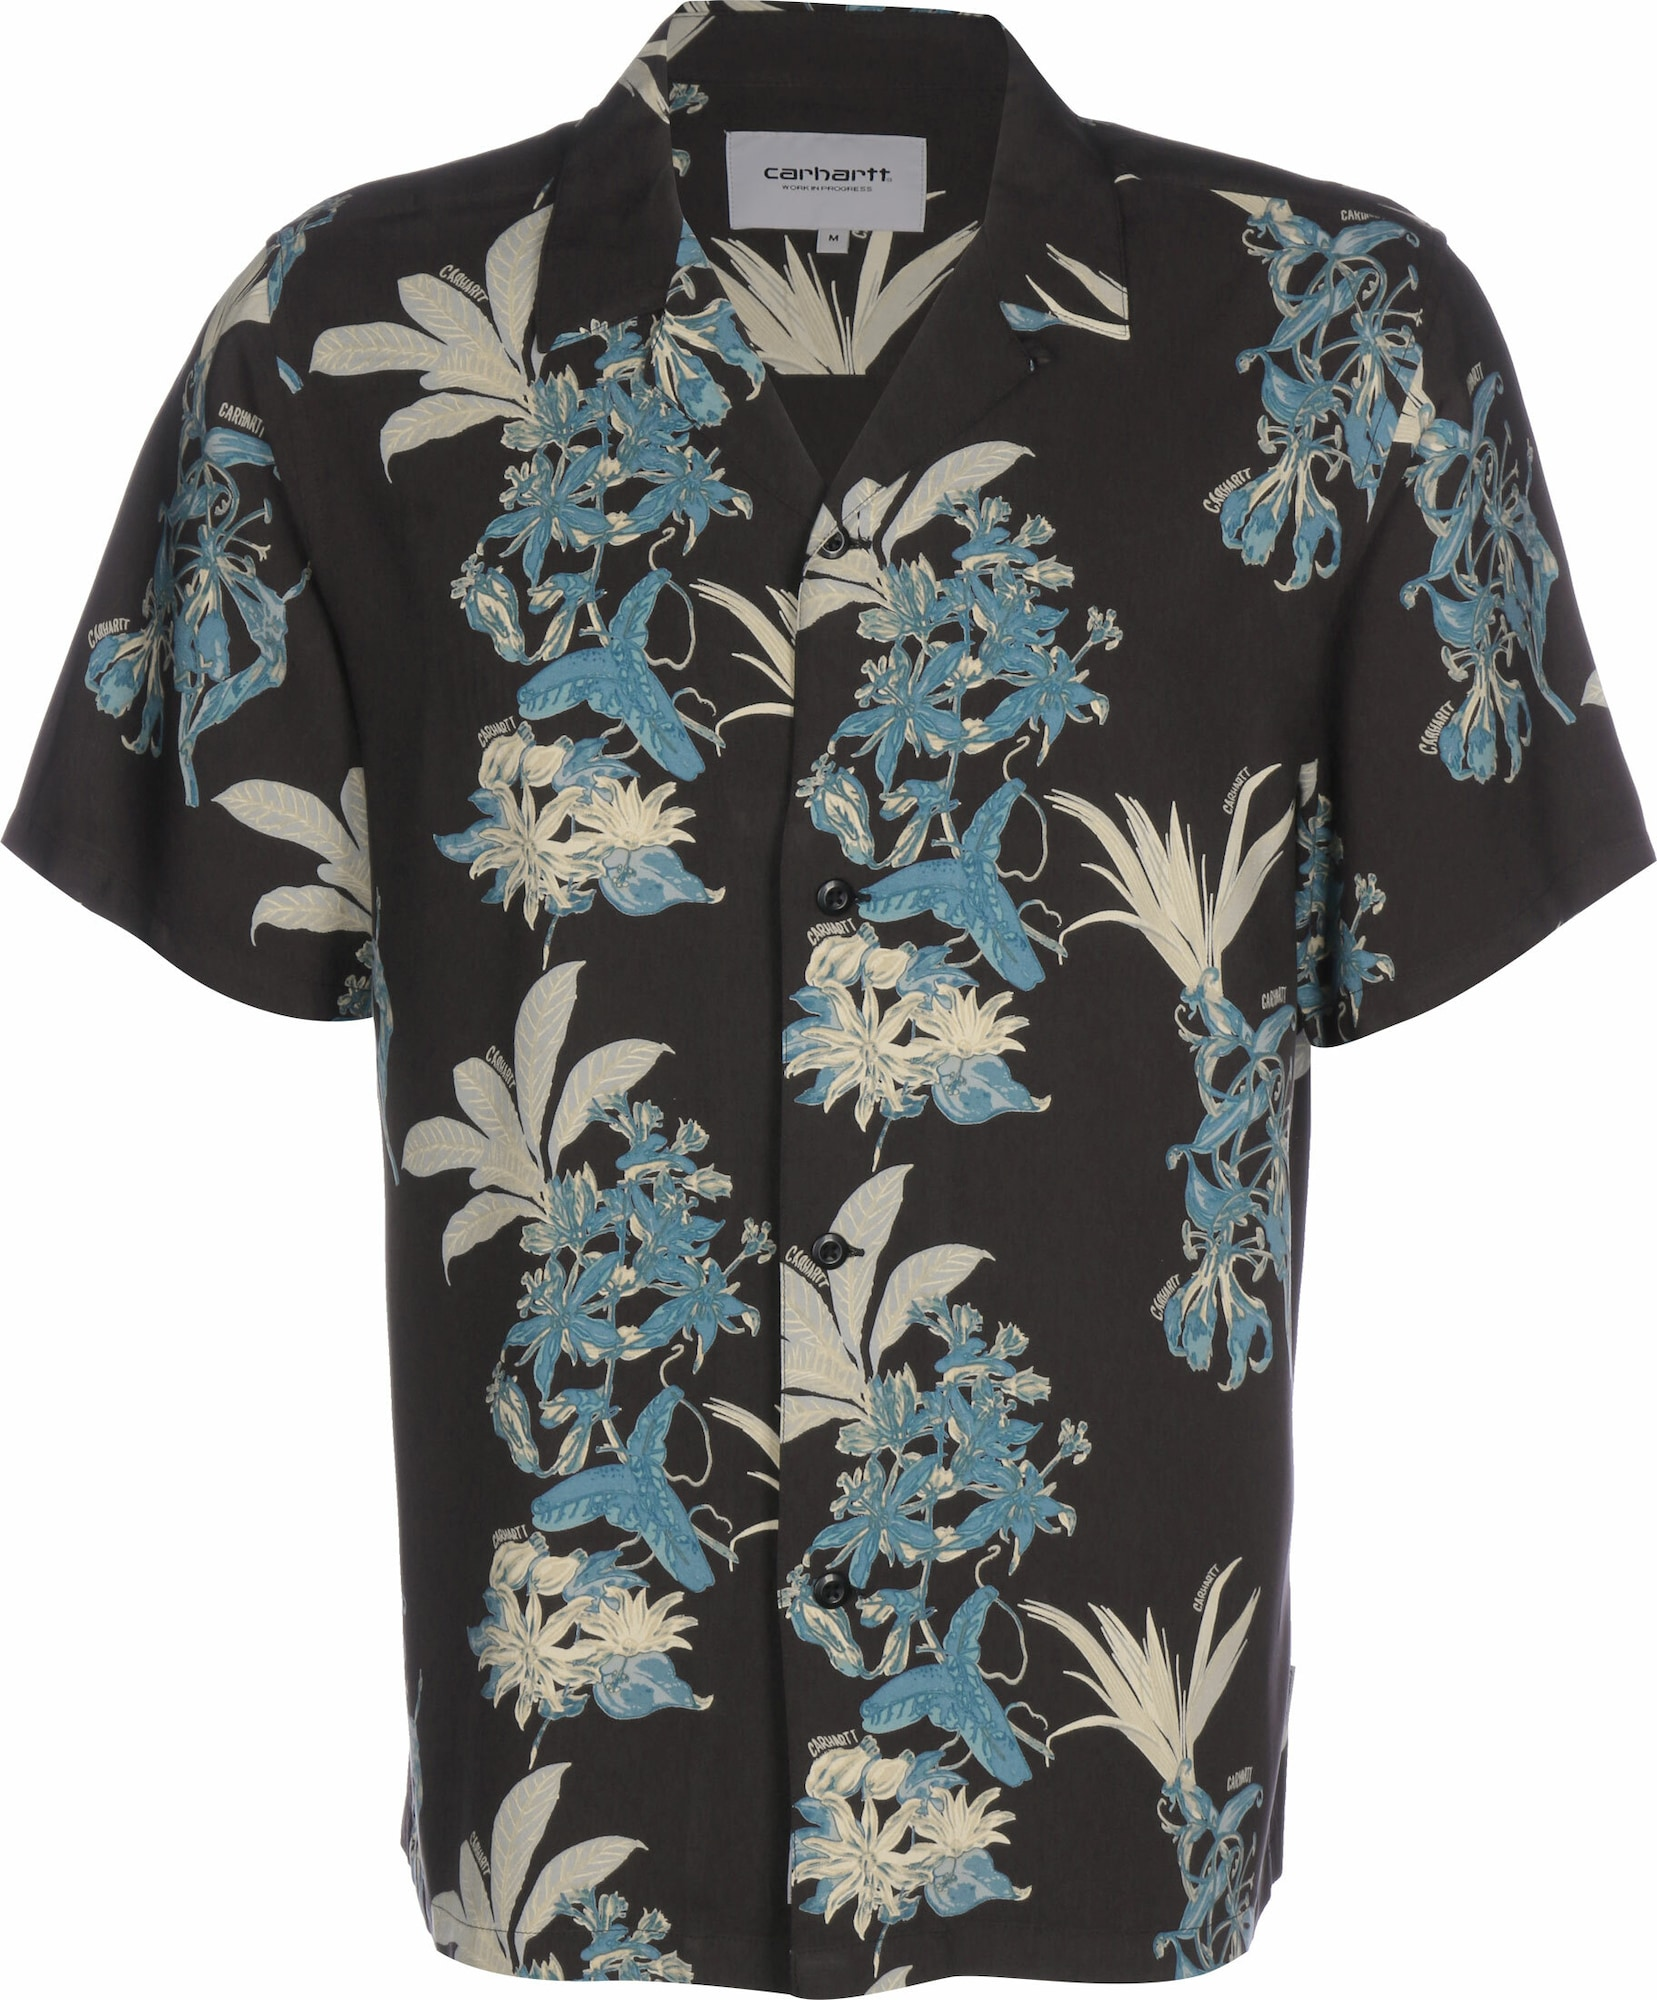 Carhartt WIP Marškiniai